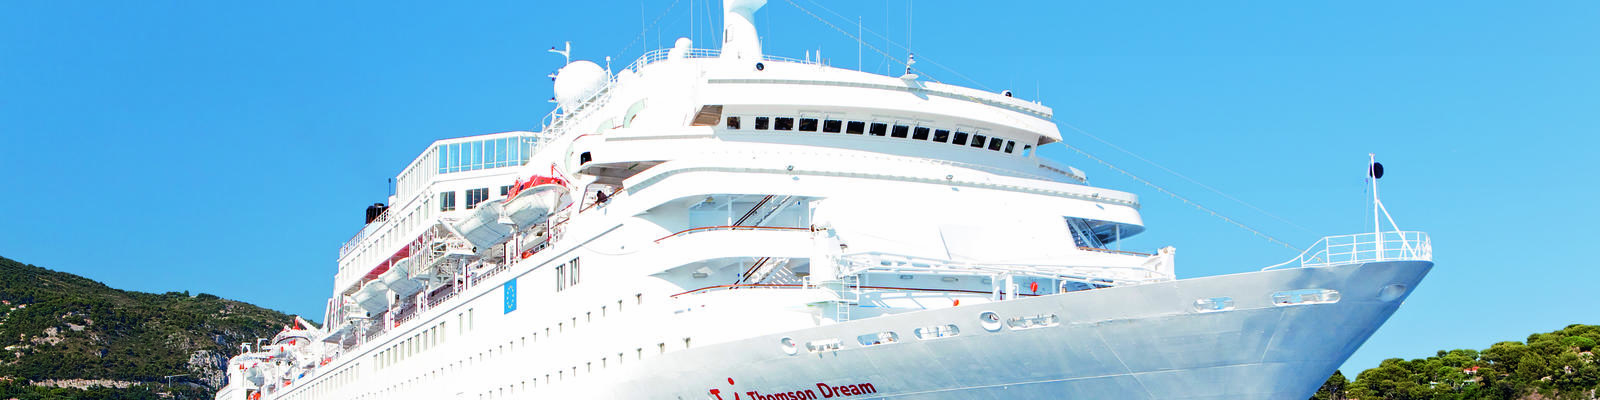 Marella Dream Cruise Ship Review Photos Departure Ports On - Thomson dream cruise ship latest news